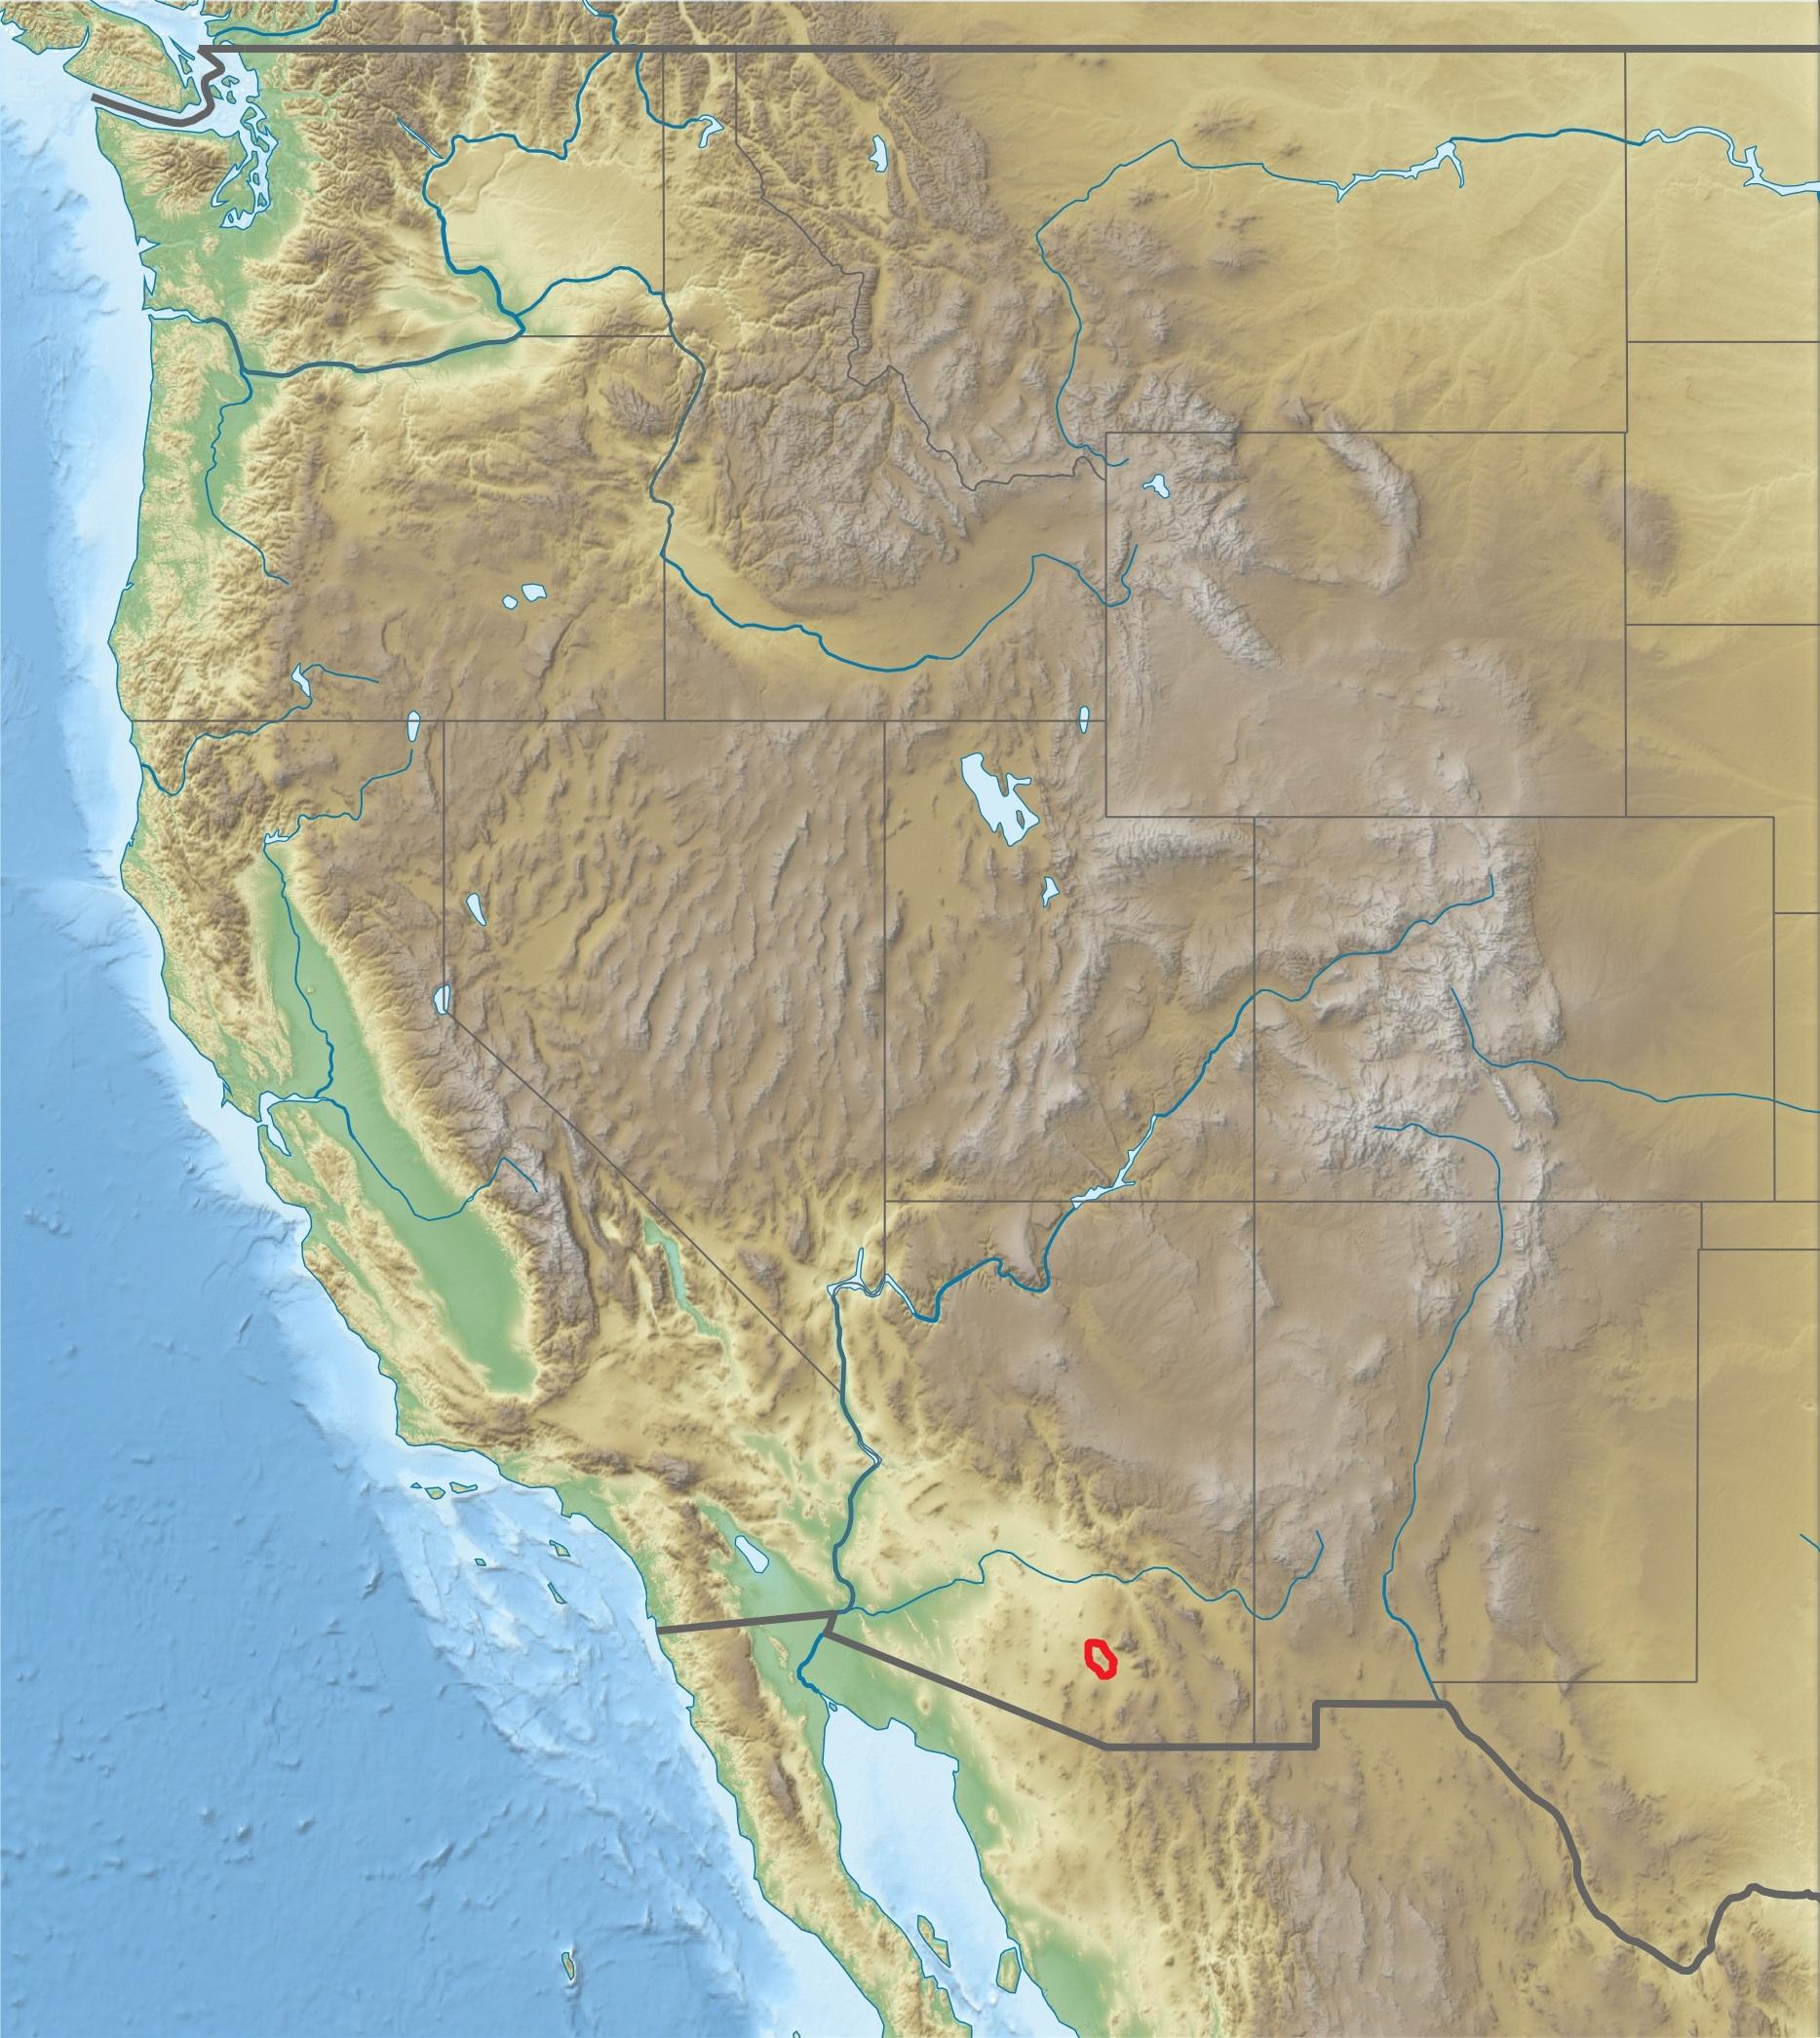 File:USA Region West relief Tucson Mountains location map ... on arizona tucson, zip code map tucson, weather tucson, street map tucson,